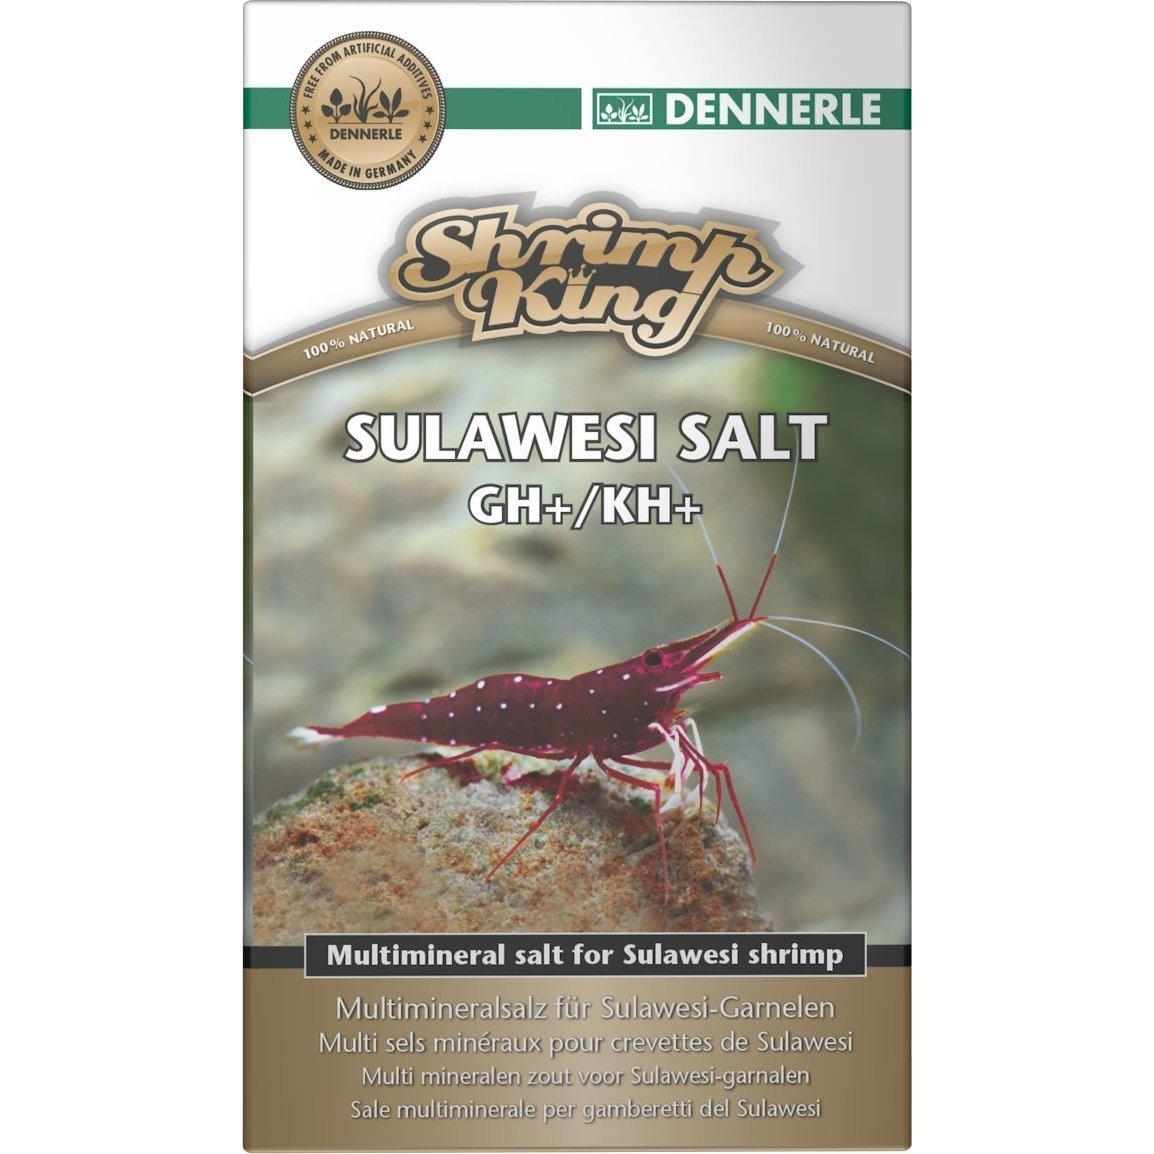 Dennerle Shrimp King Sulawesi Salt GH+/KH+, 200 Gramm